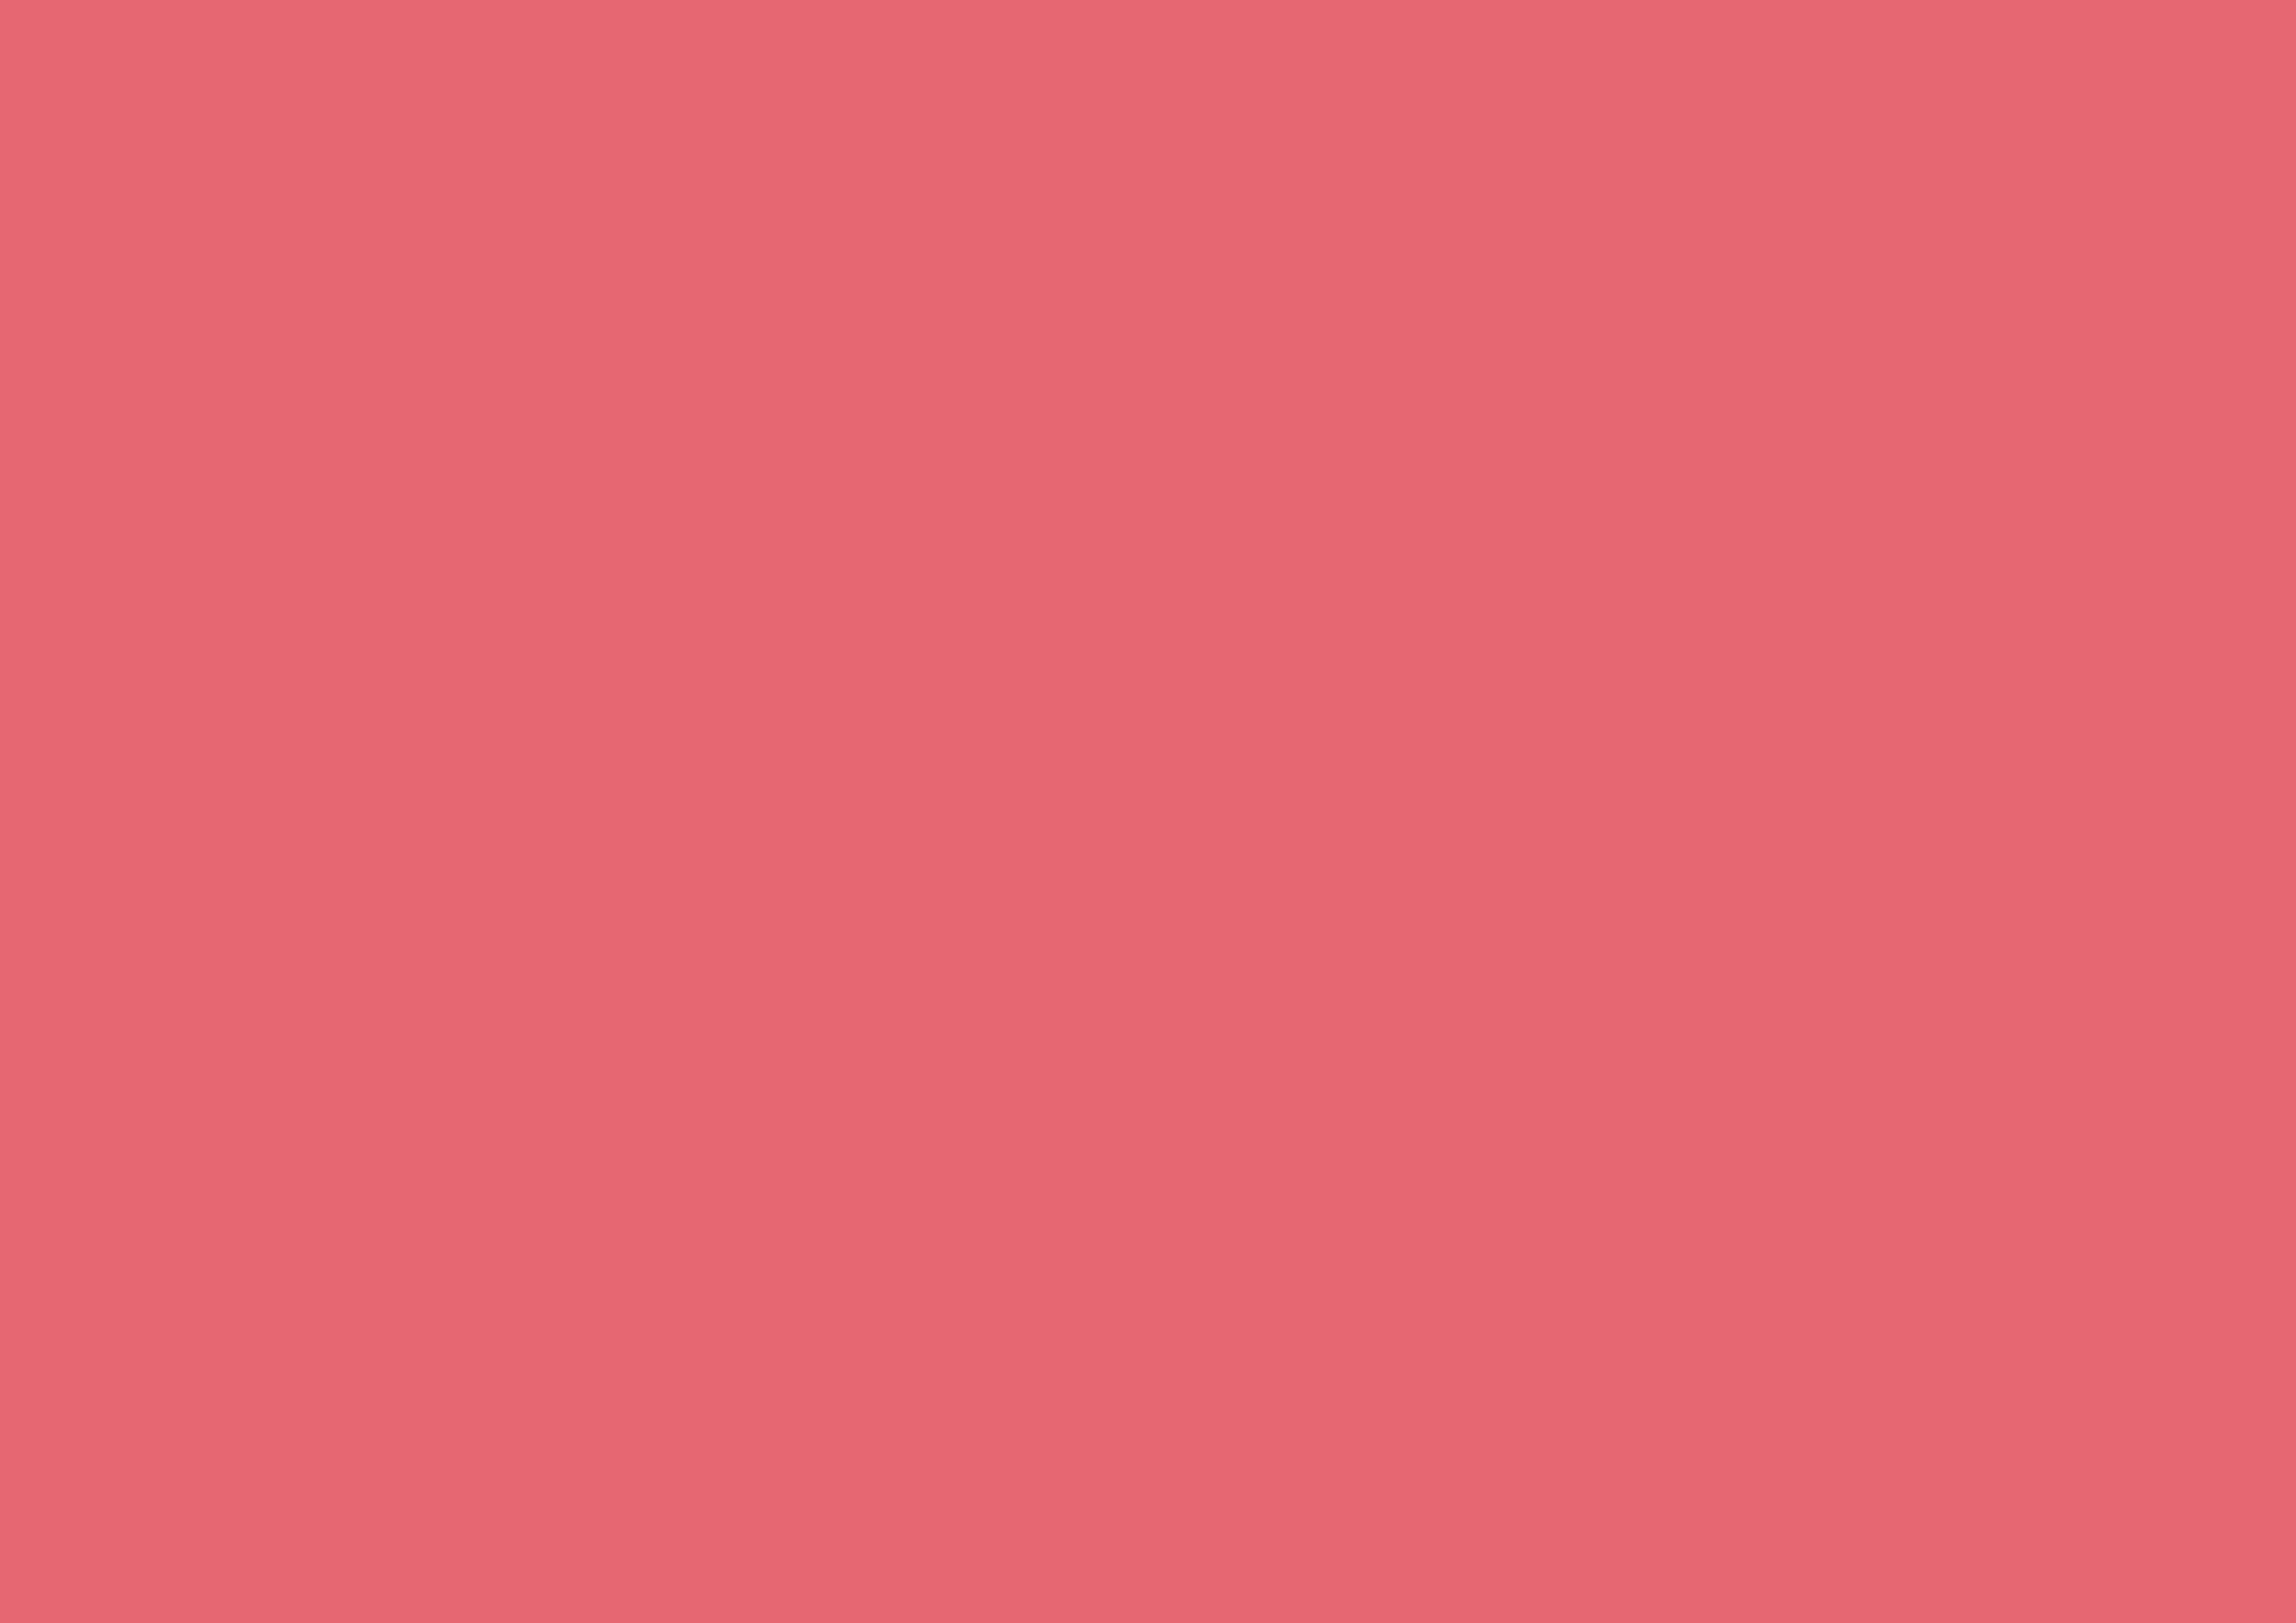 3508x2480 Light Carmine Pink Solid Color Background